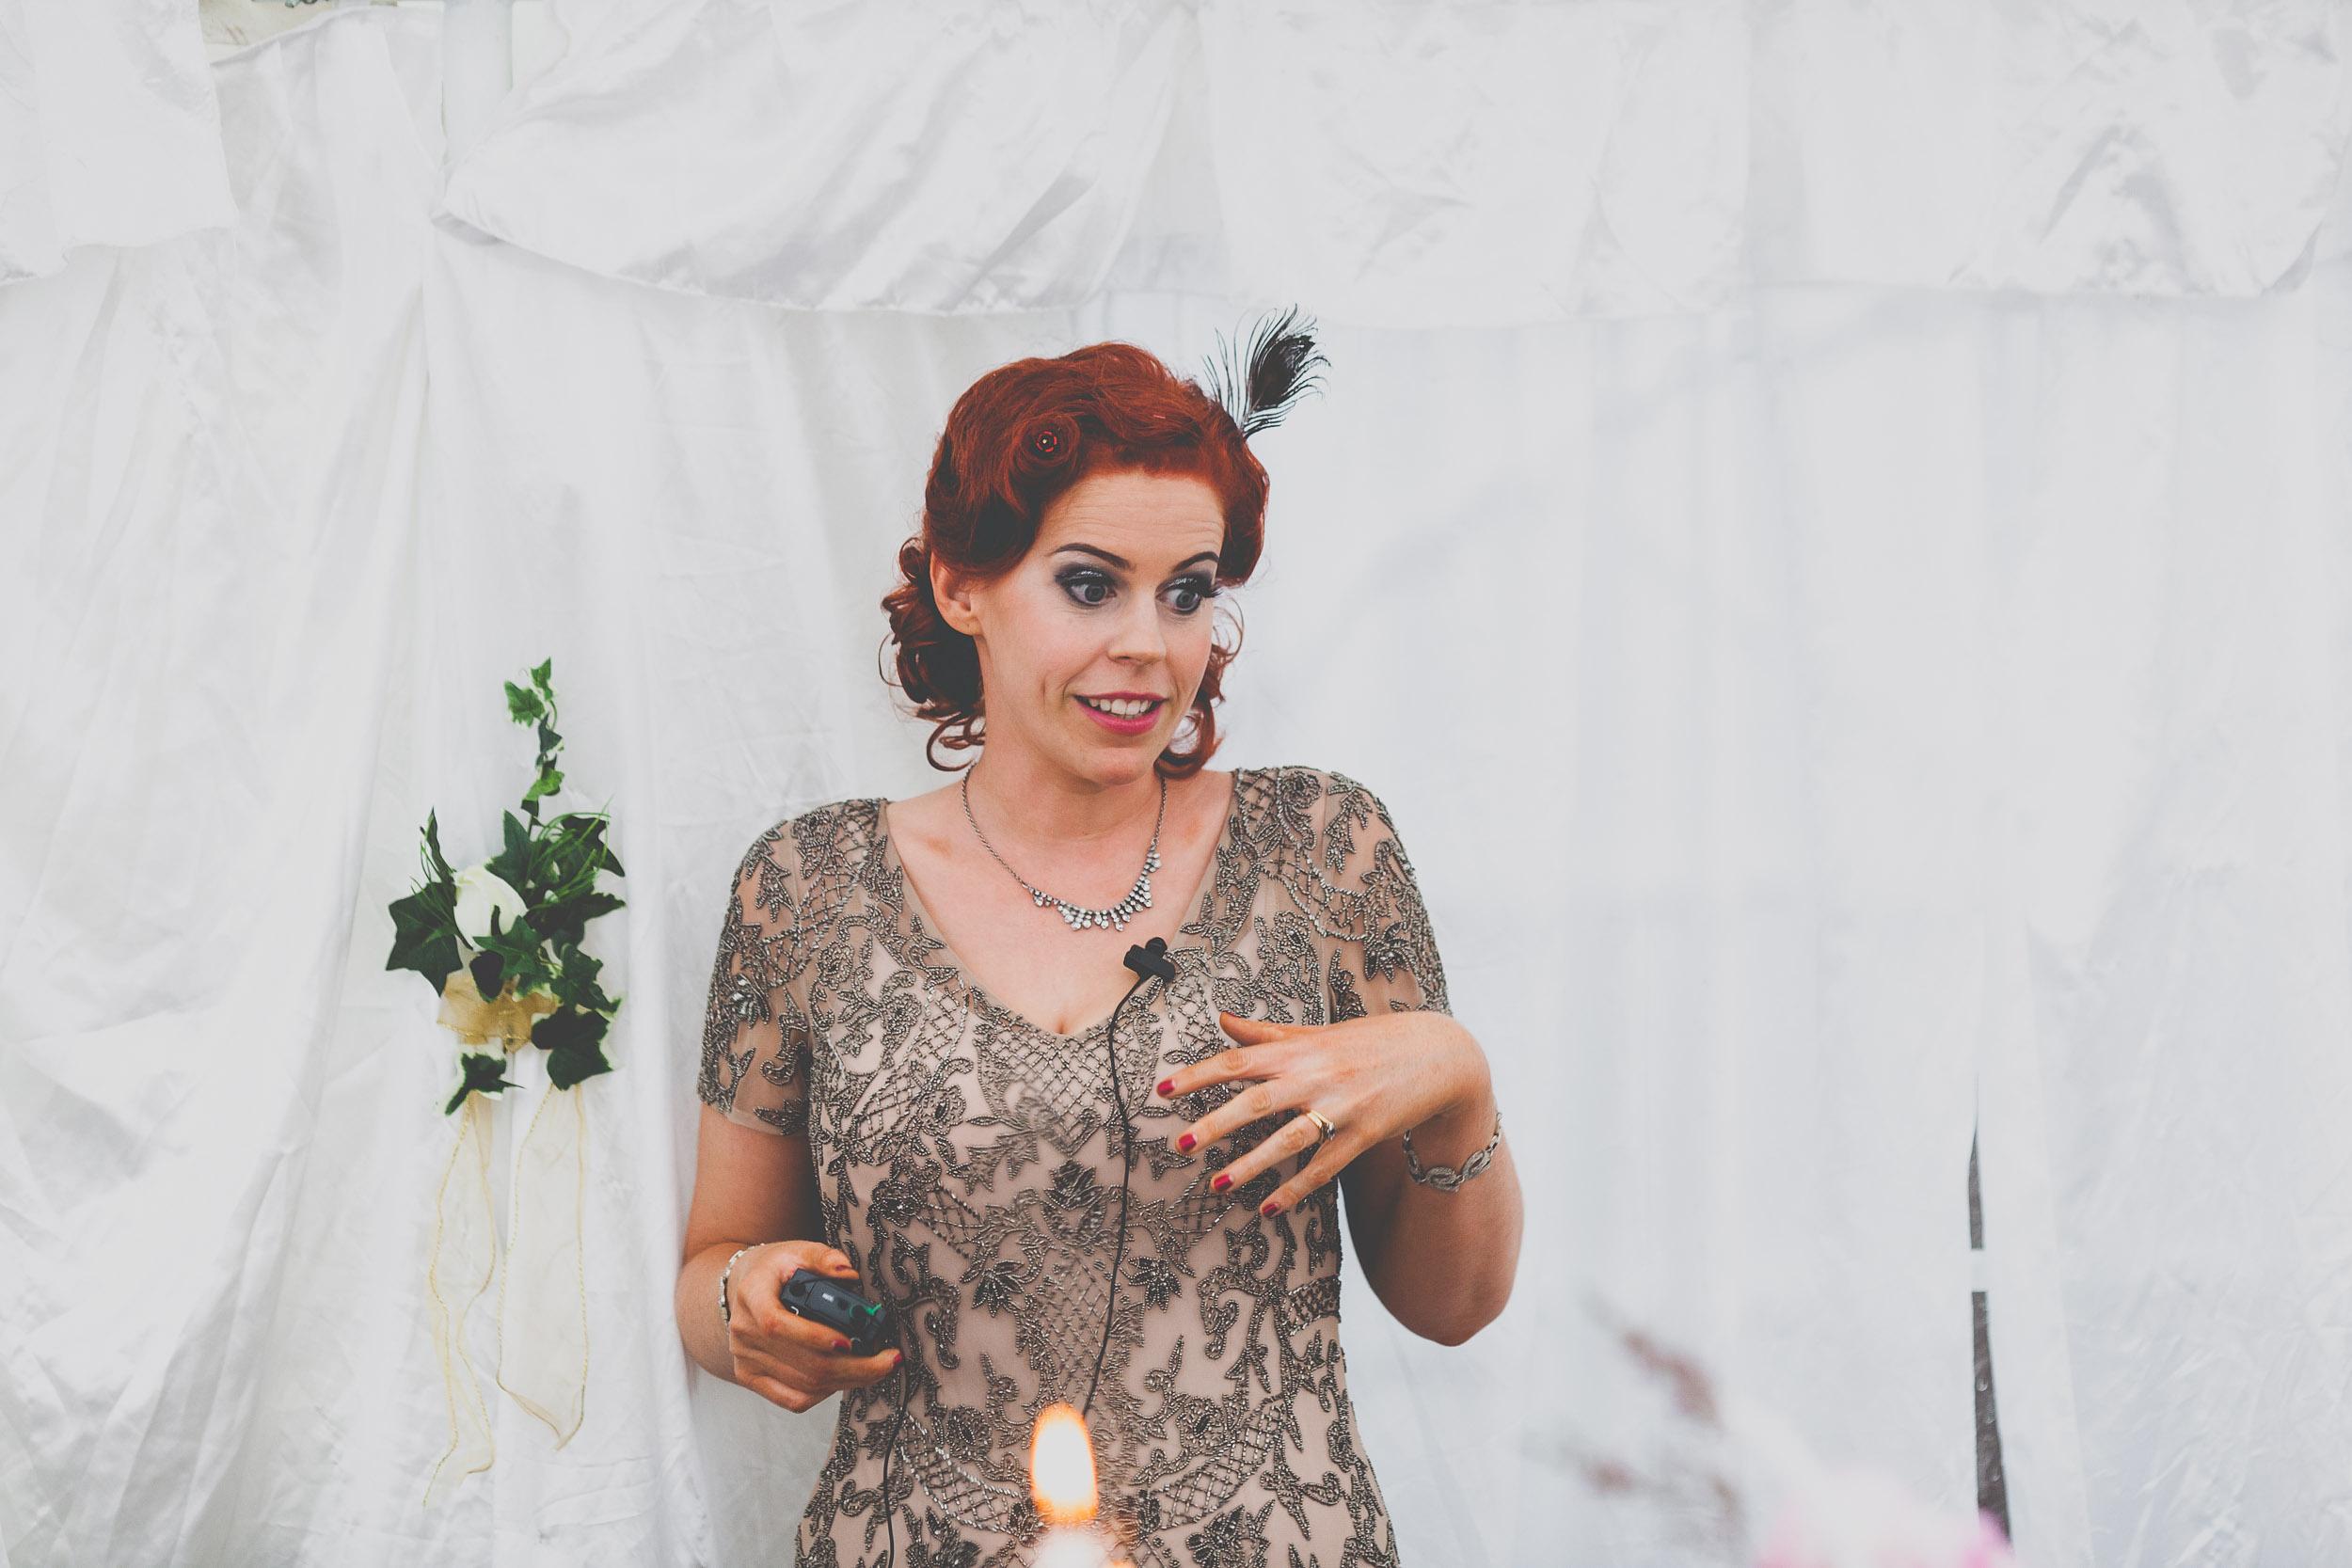 queen-elizabeths-hunting-lodge-epping-forest-wedding354.jpg